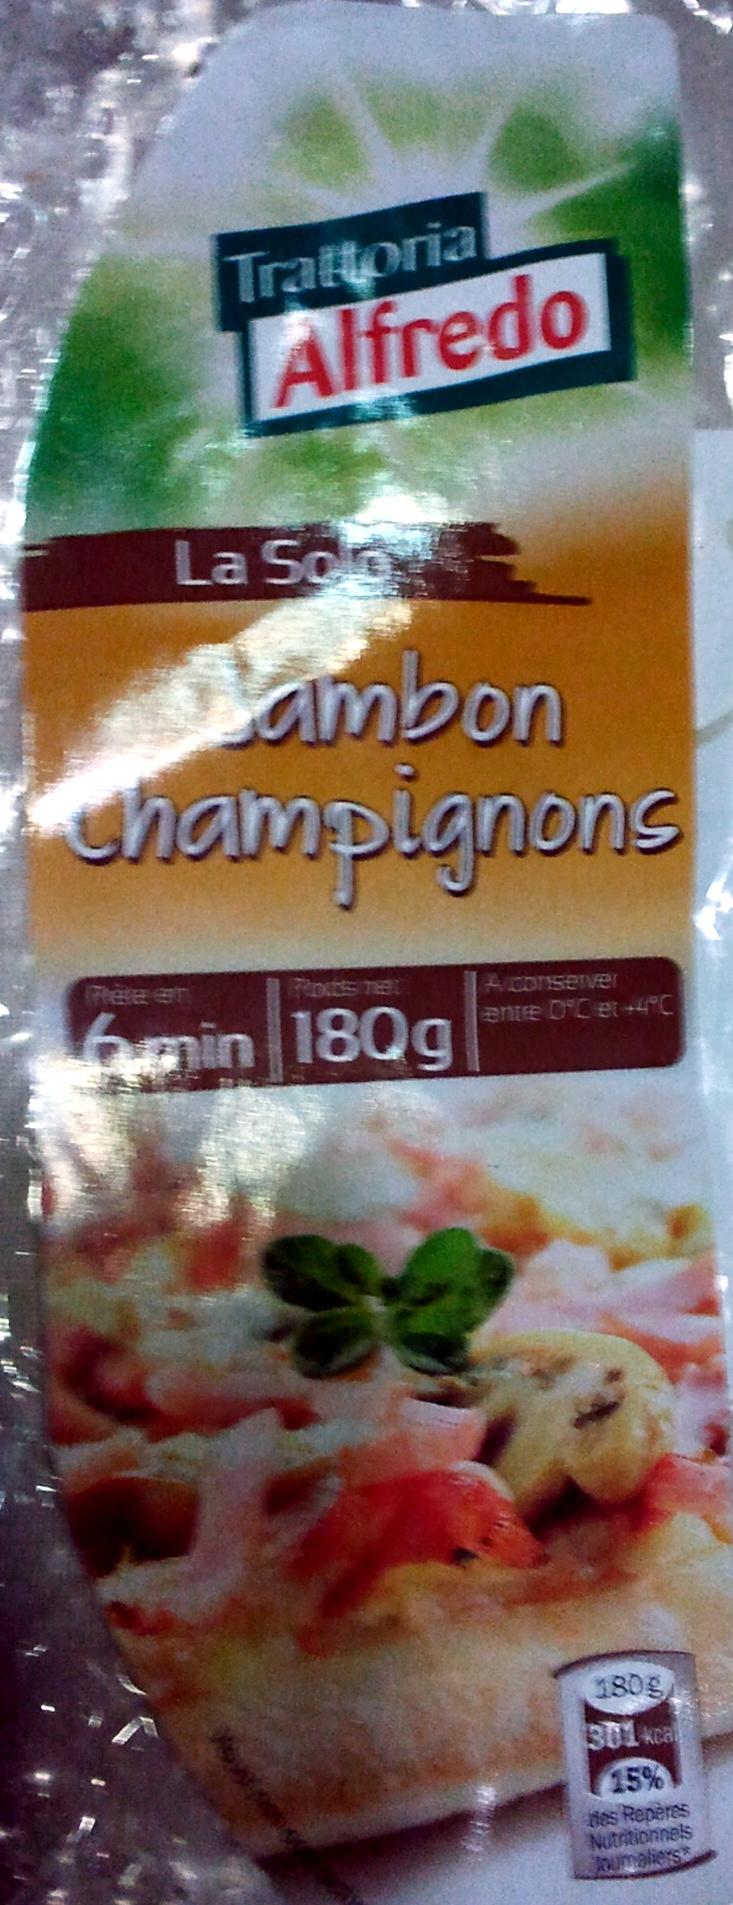 Pizza Jambon Champignons - Produit - fr